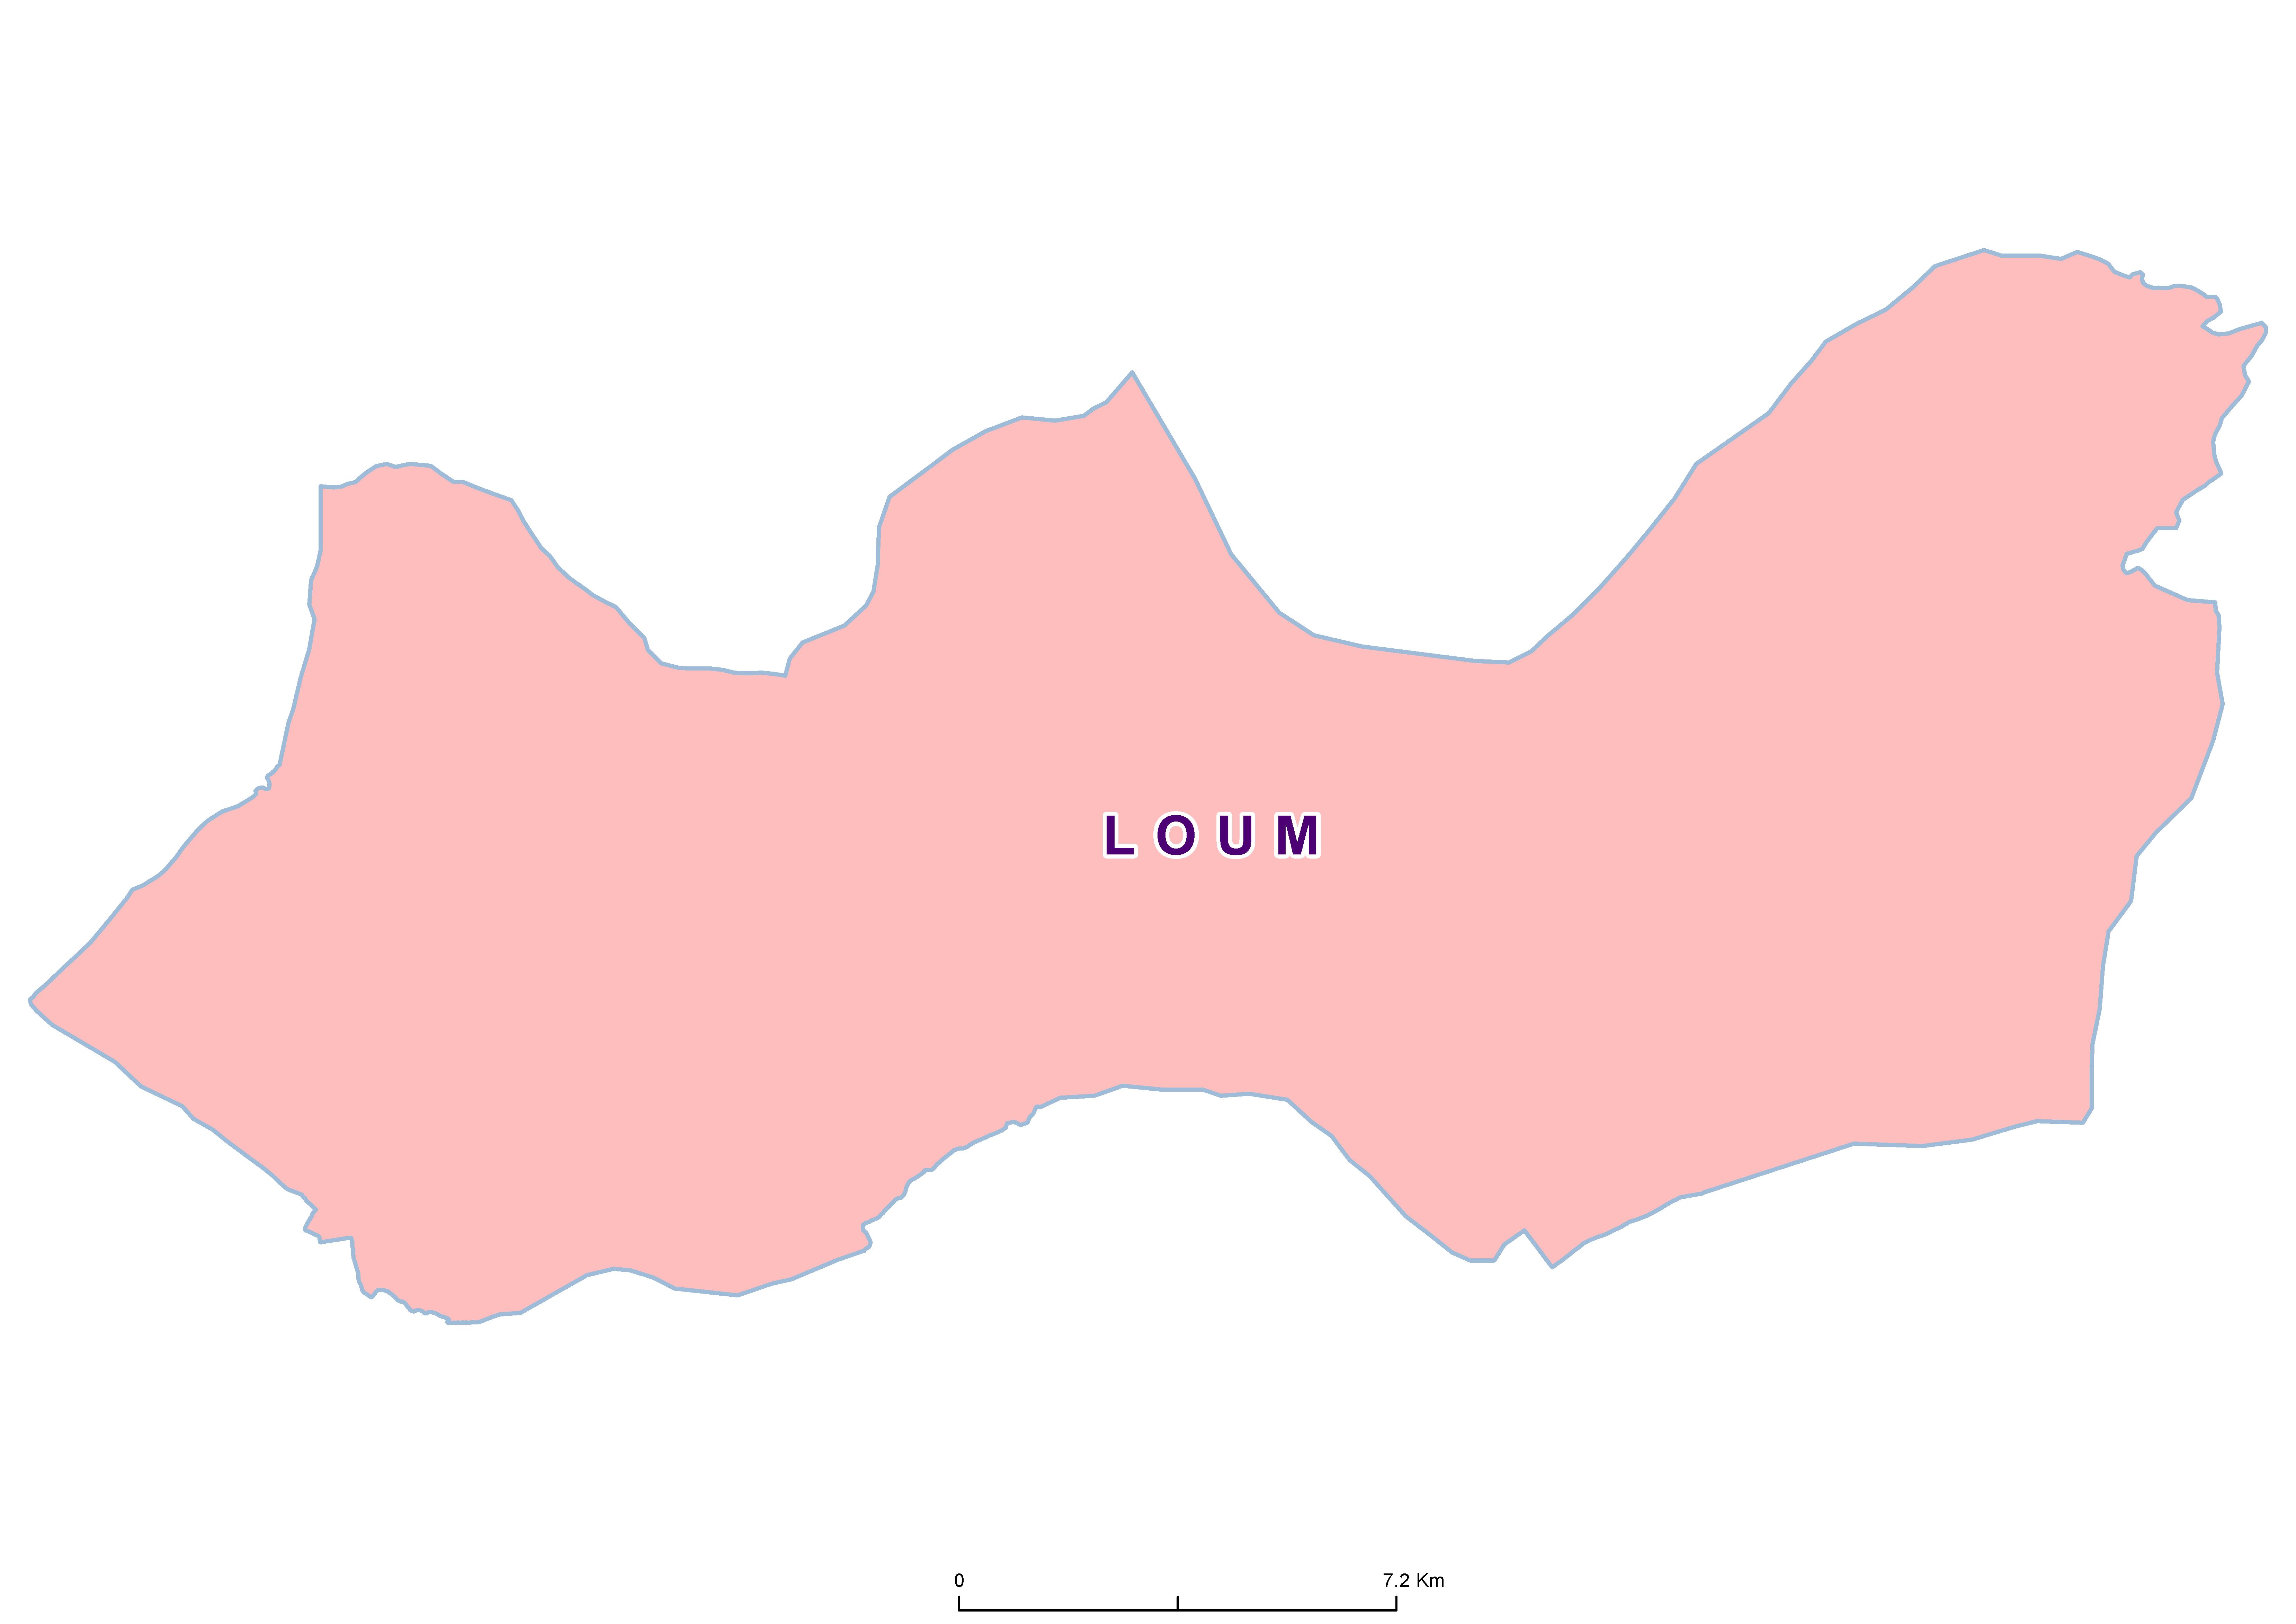 Loum Mean SCH 20100001